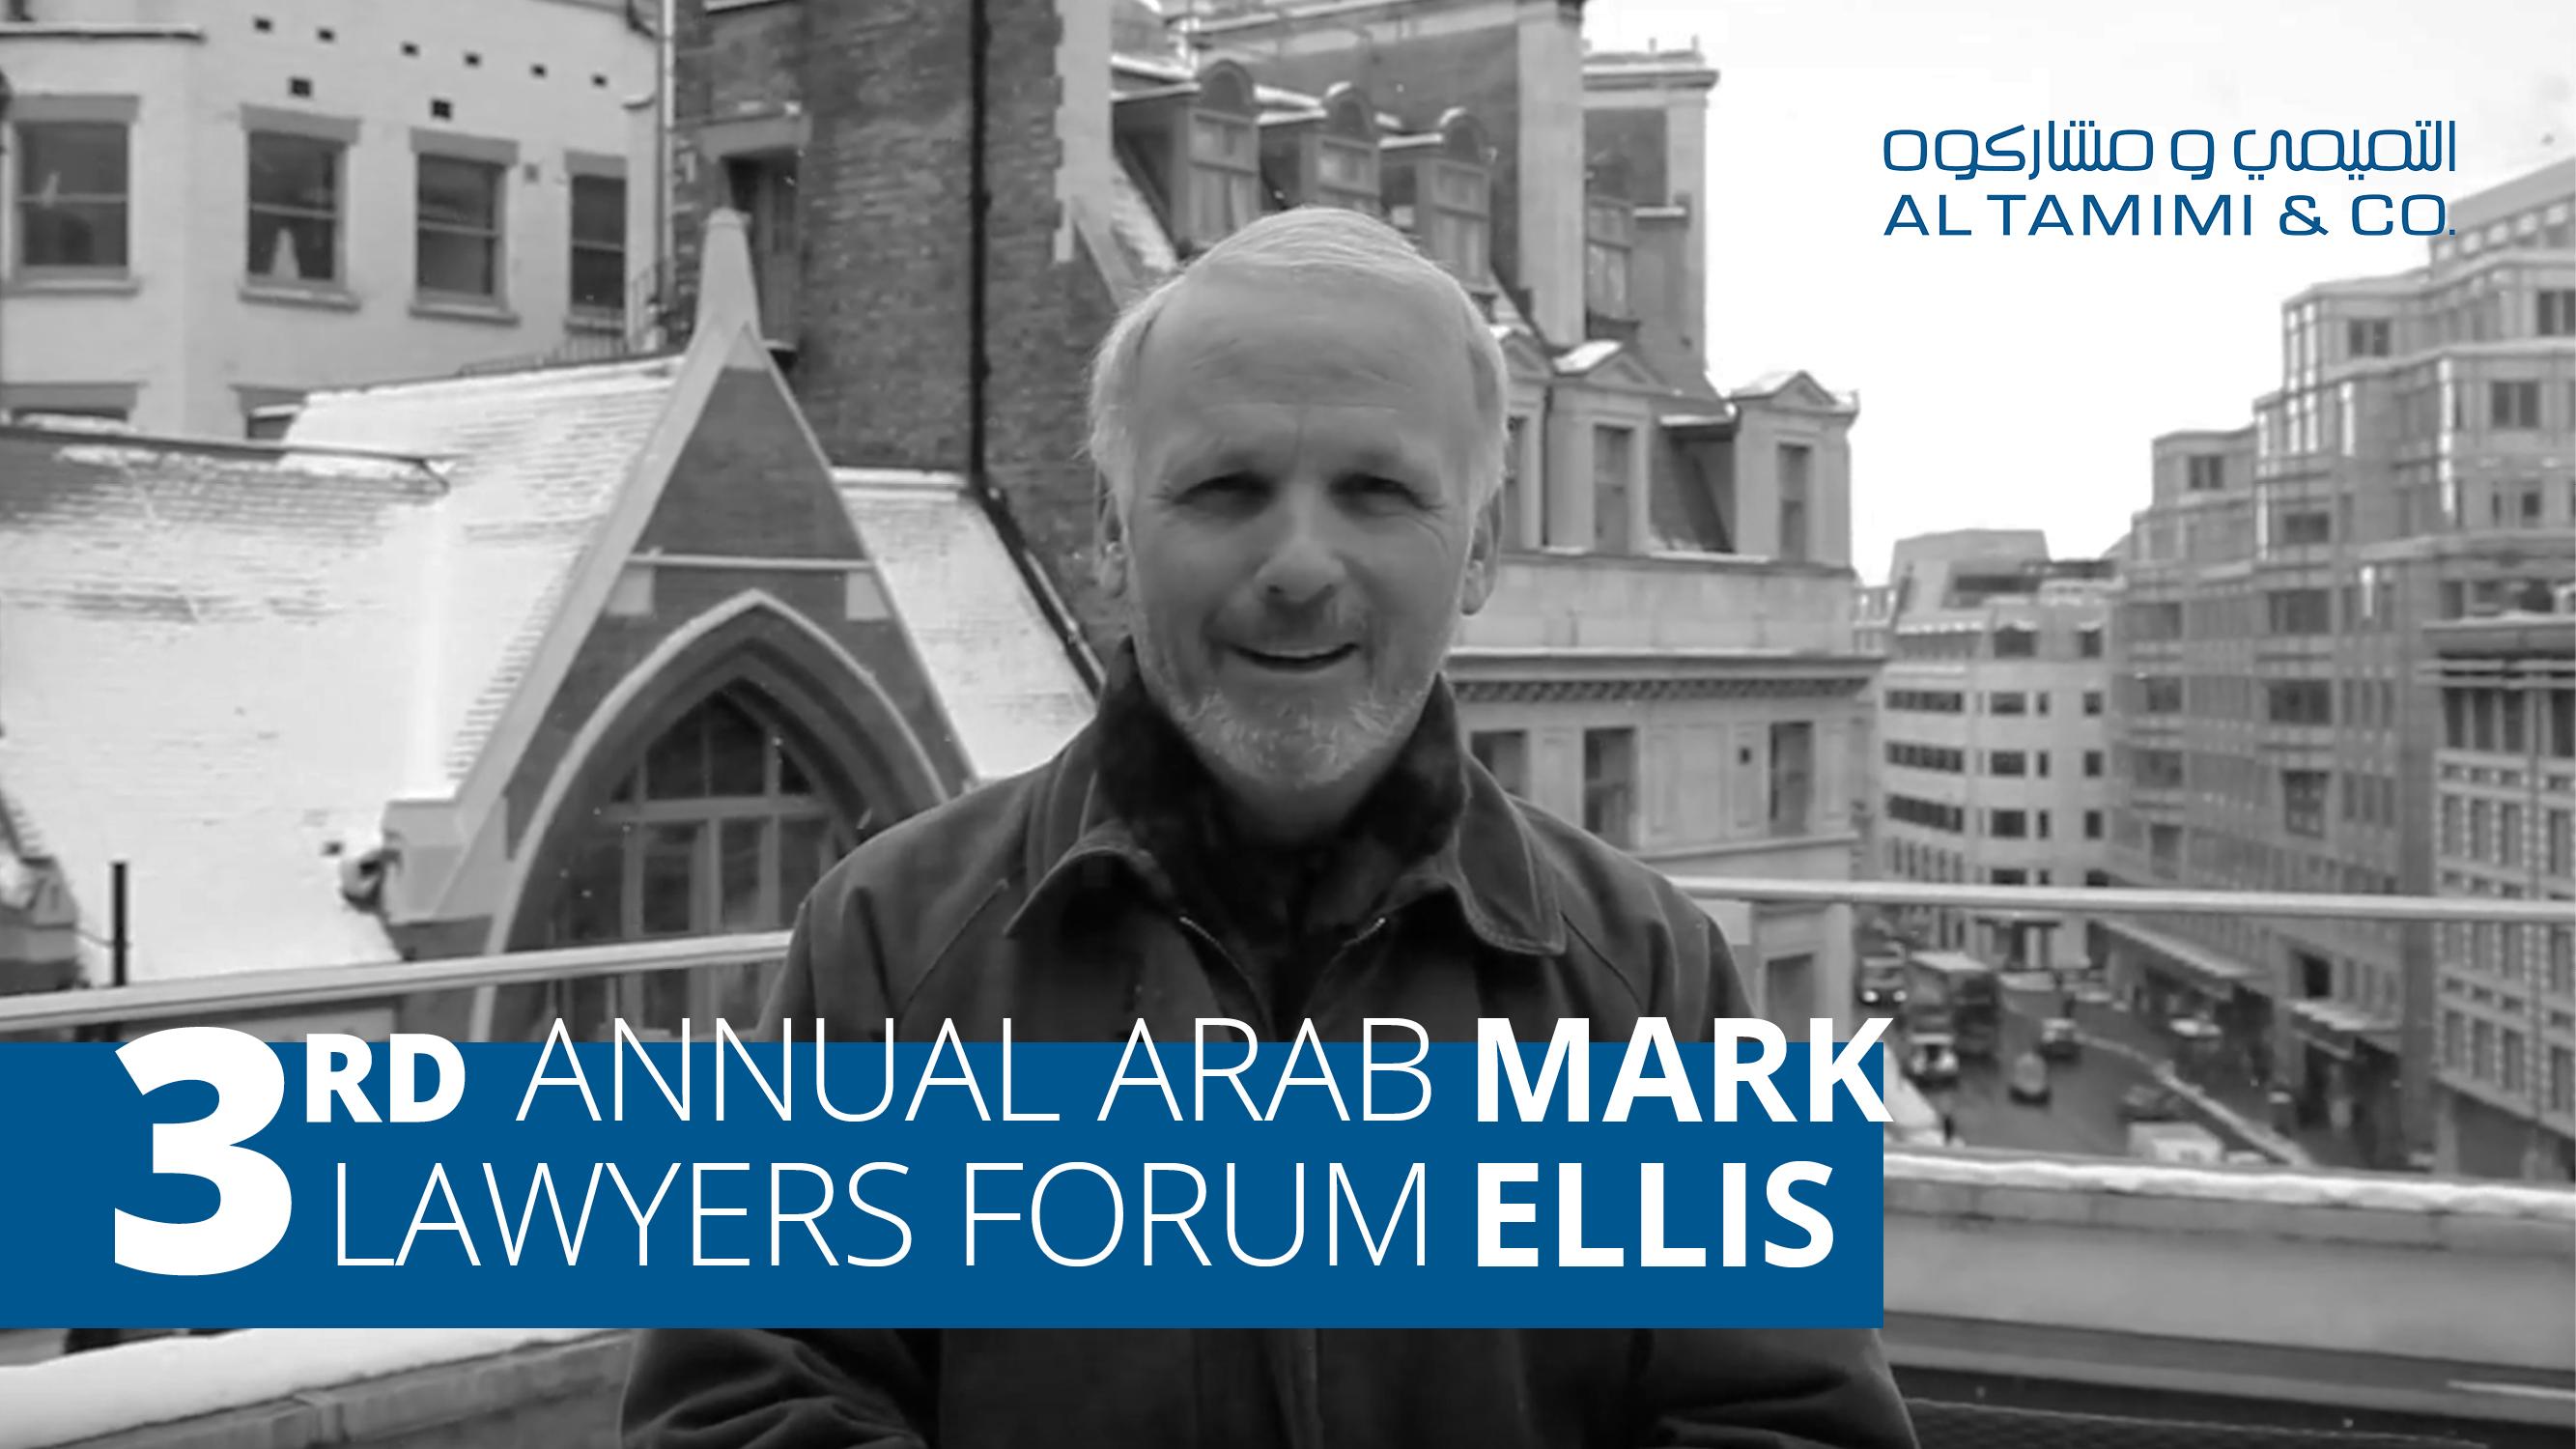 3rd Annual Arab Lawyers Forum, Bahrain – Mark Ellis, Executive Director, IBA